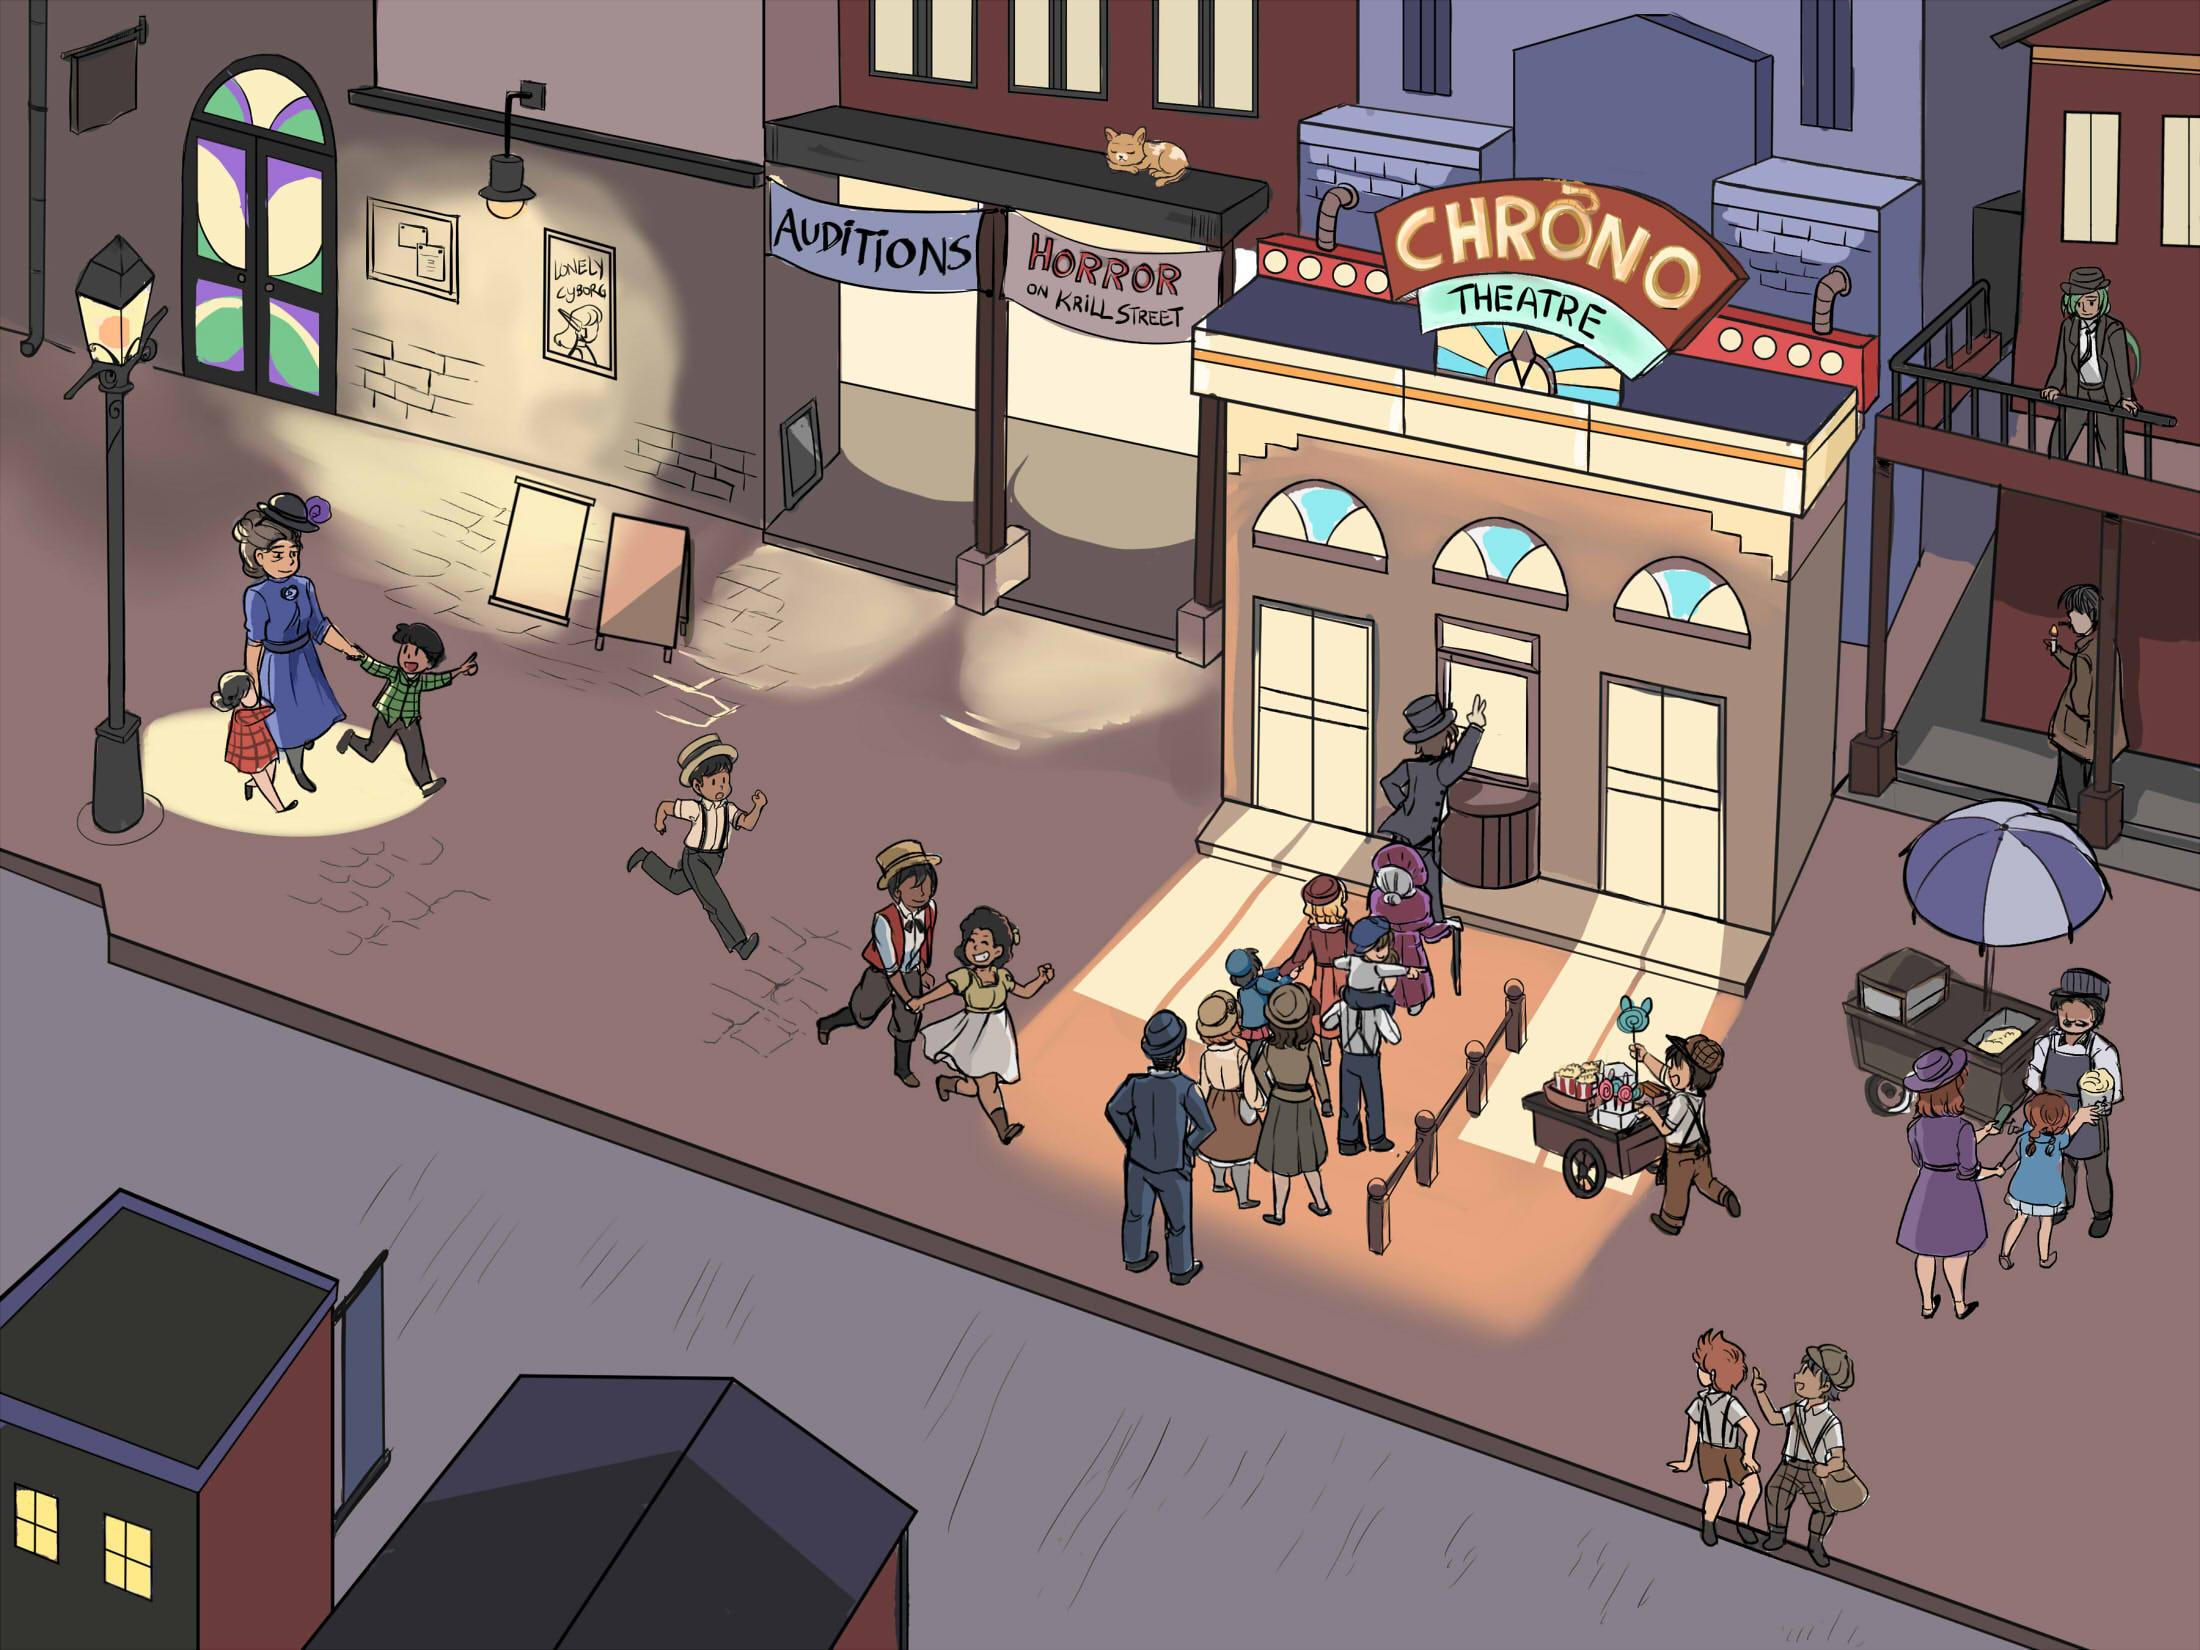 Chrono Theater - Crowd scene